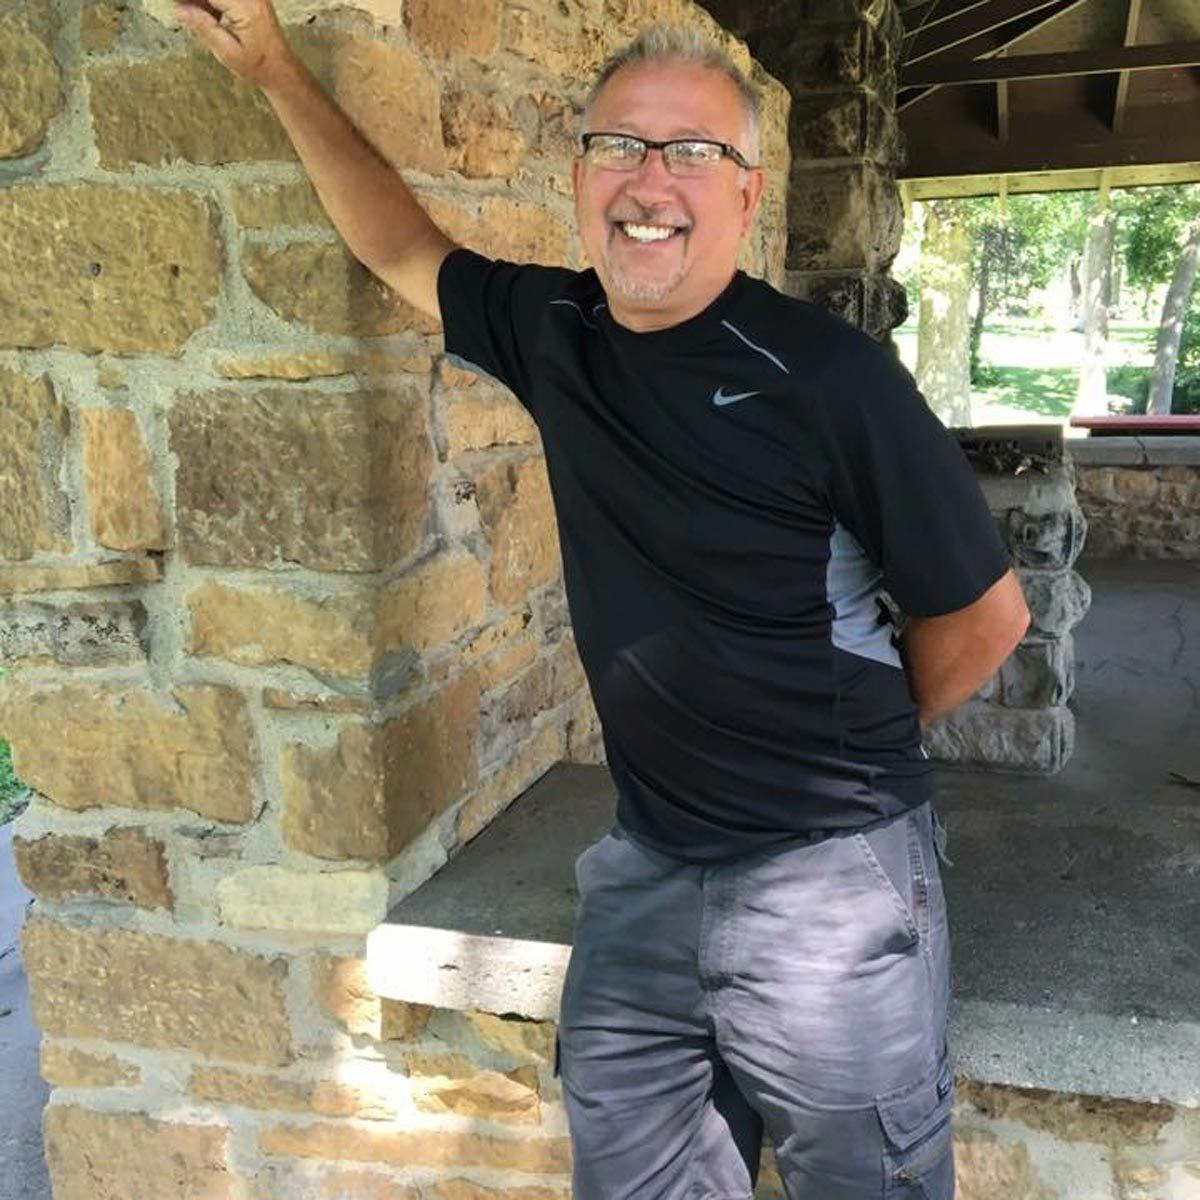 David-Duncan-family handyman